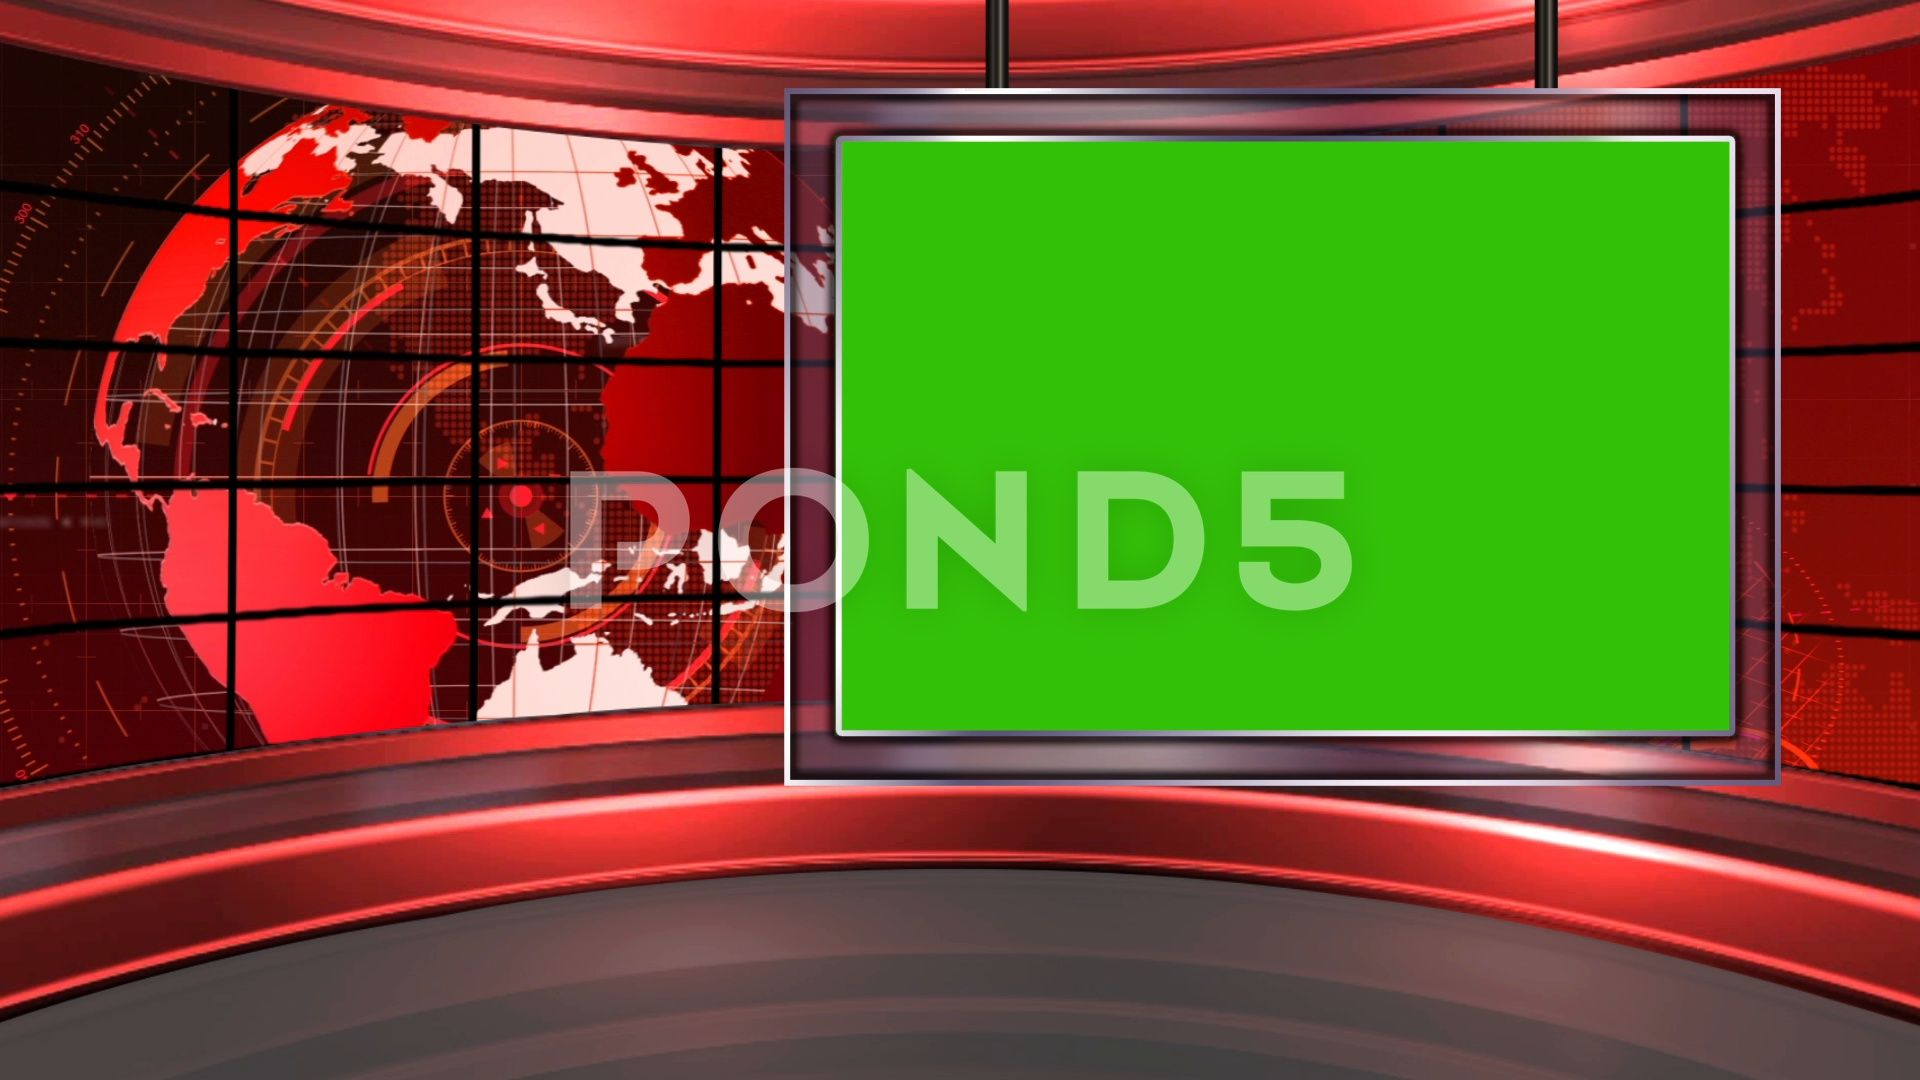 Hd News Tv Virtual Studio Green Screen Background Blue Colour With Globe Stock Footage Vir Green Screen Backgrounds Green Screen Video Backgrounds Greenscreen